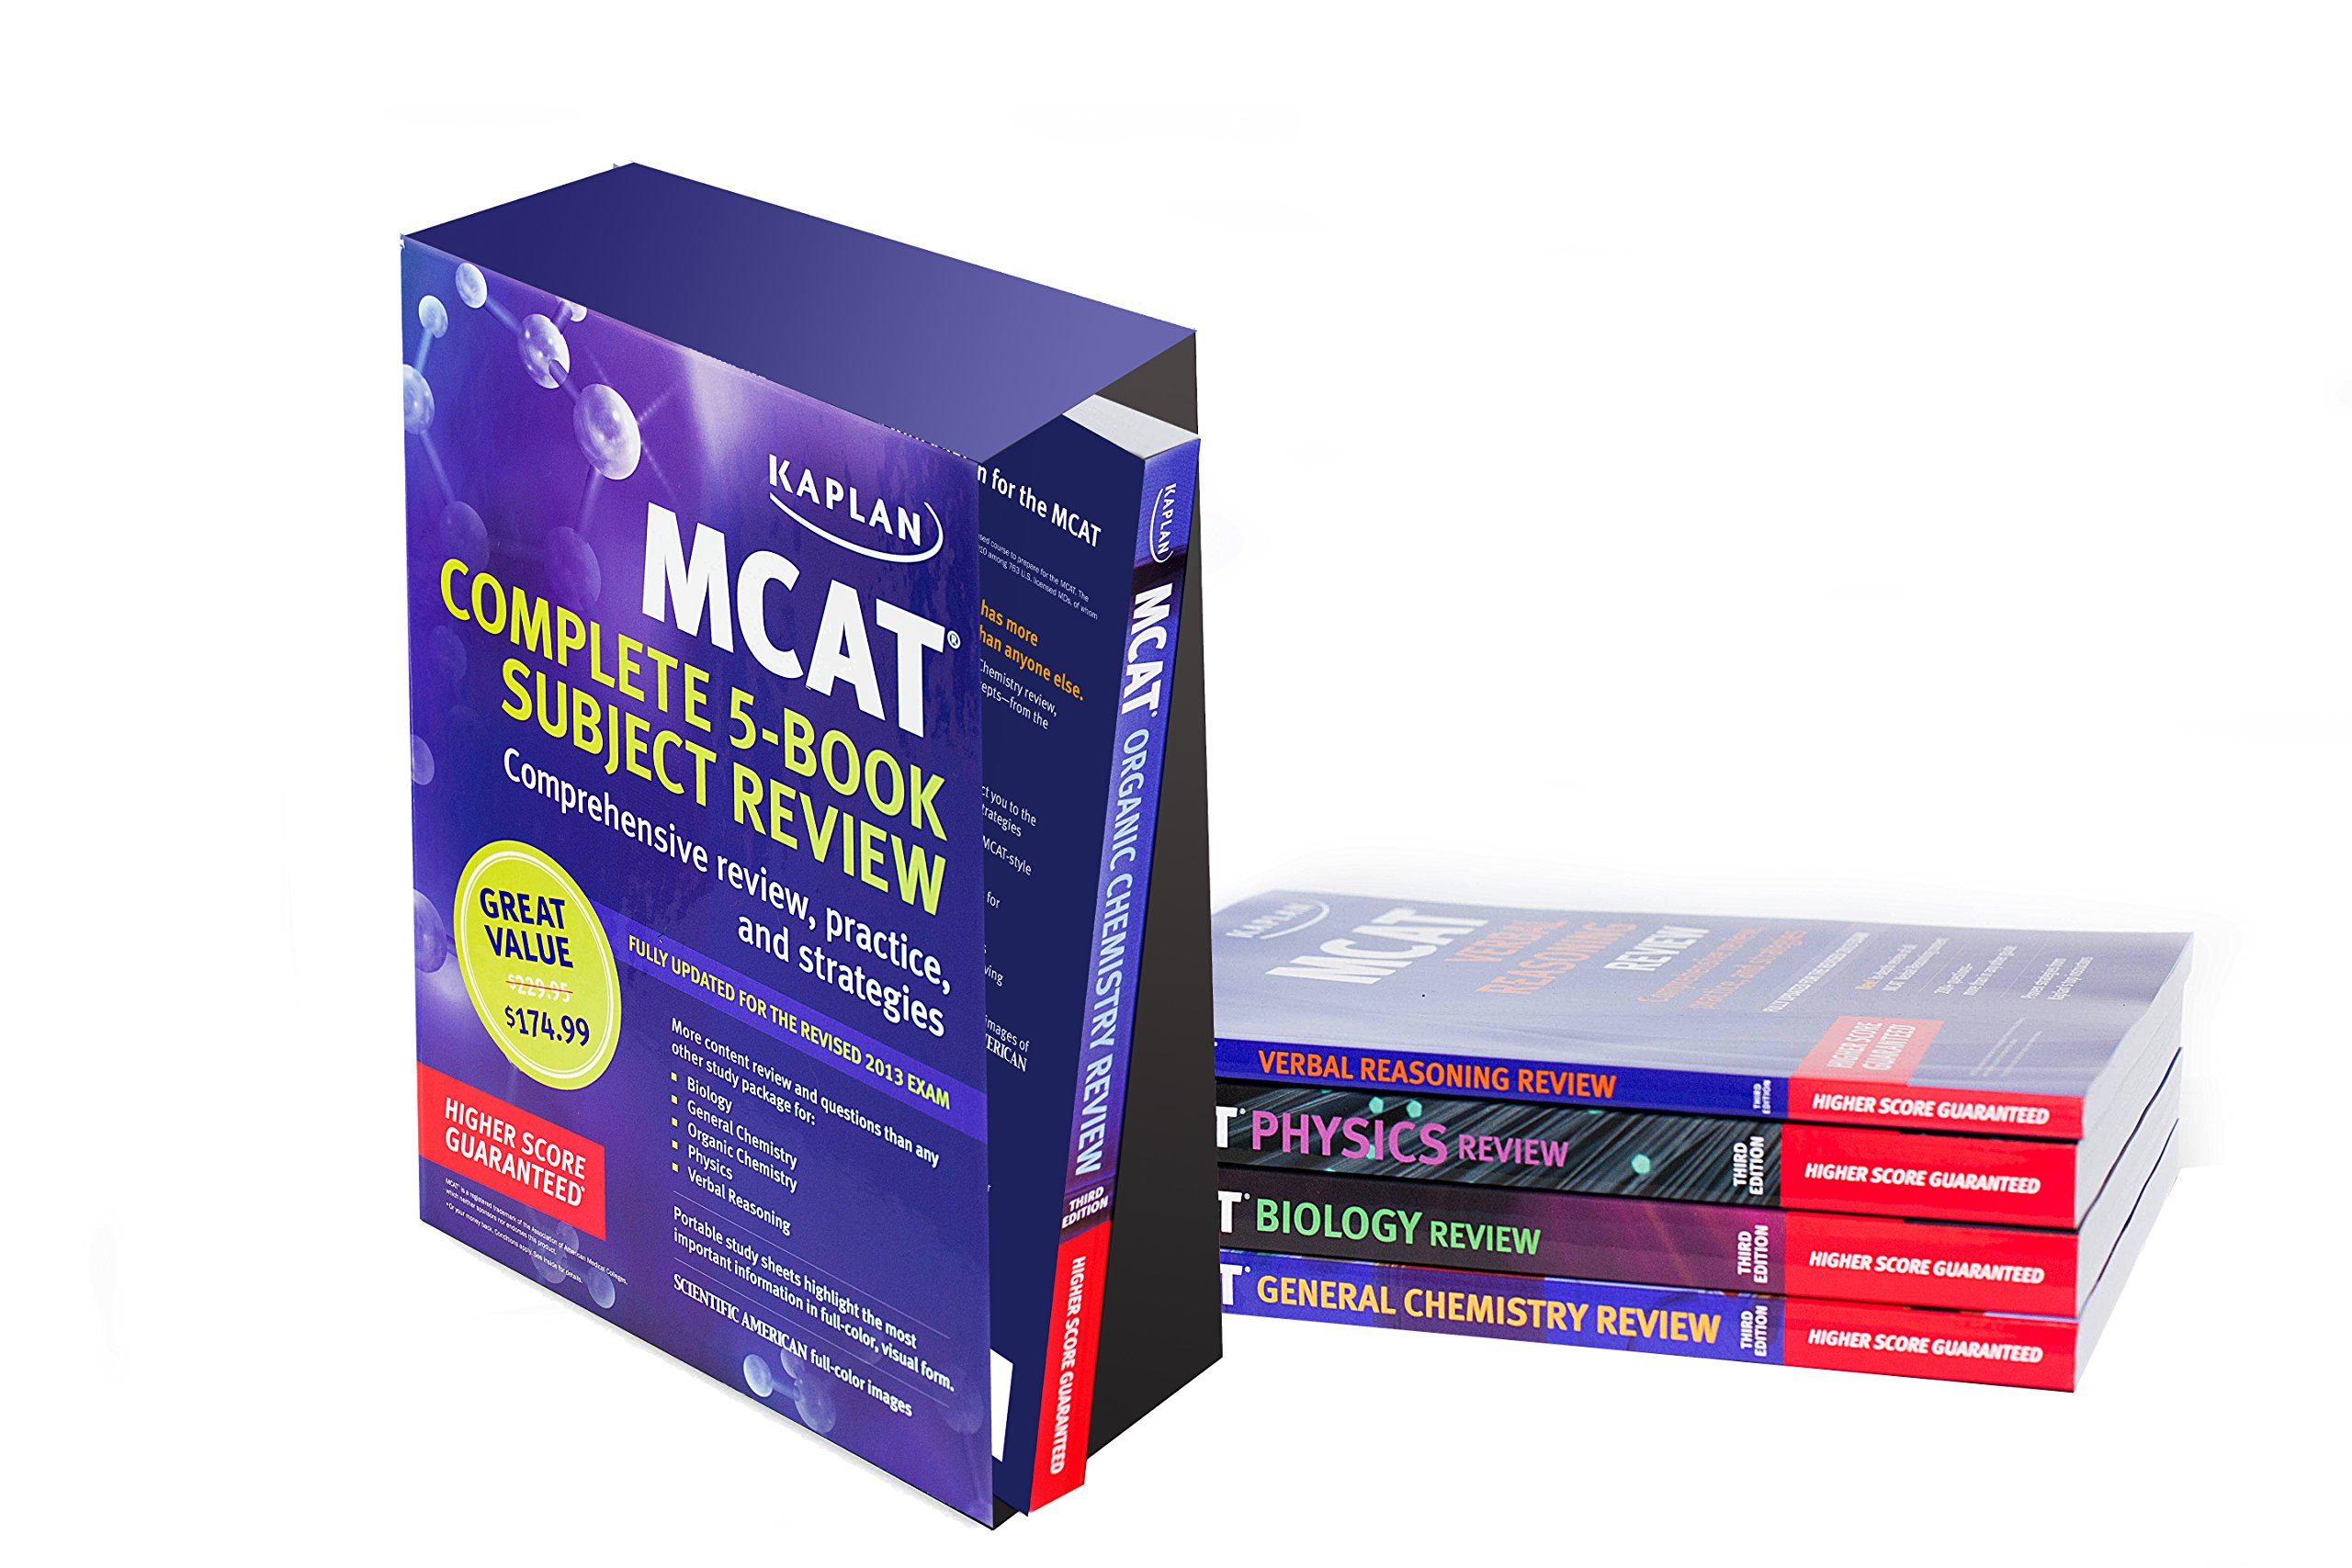 Kaplan MCAT Review Complete 5-Book Subject Review: Kaplan